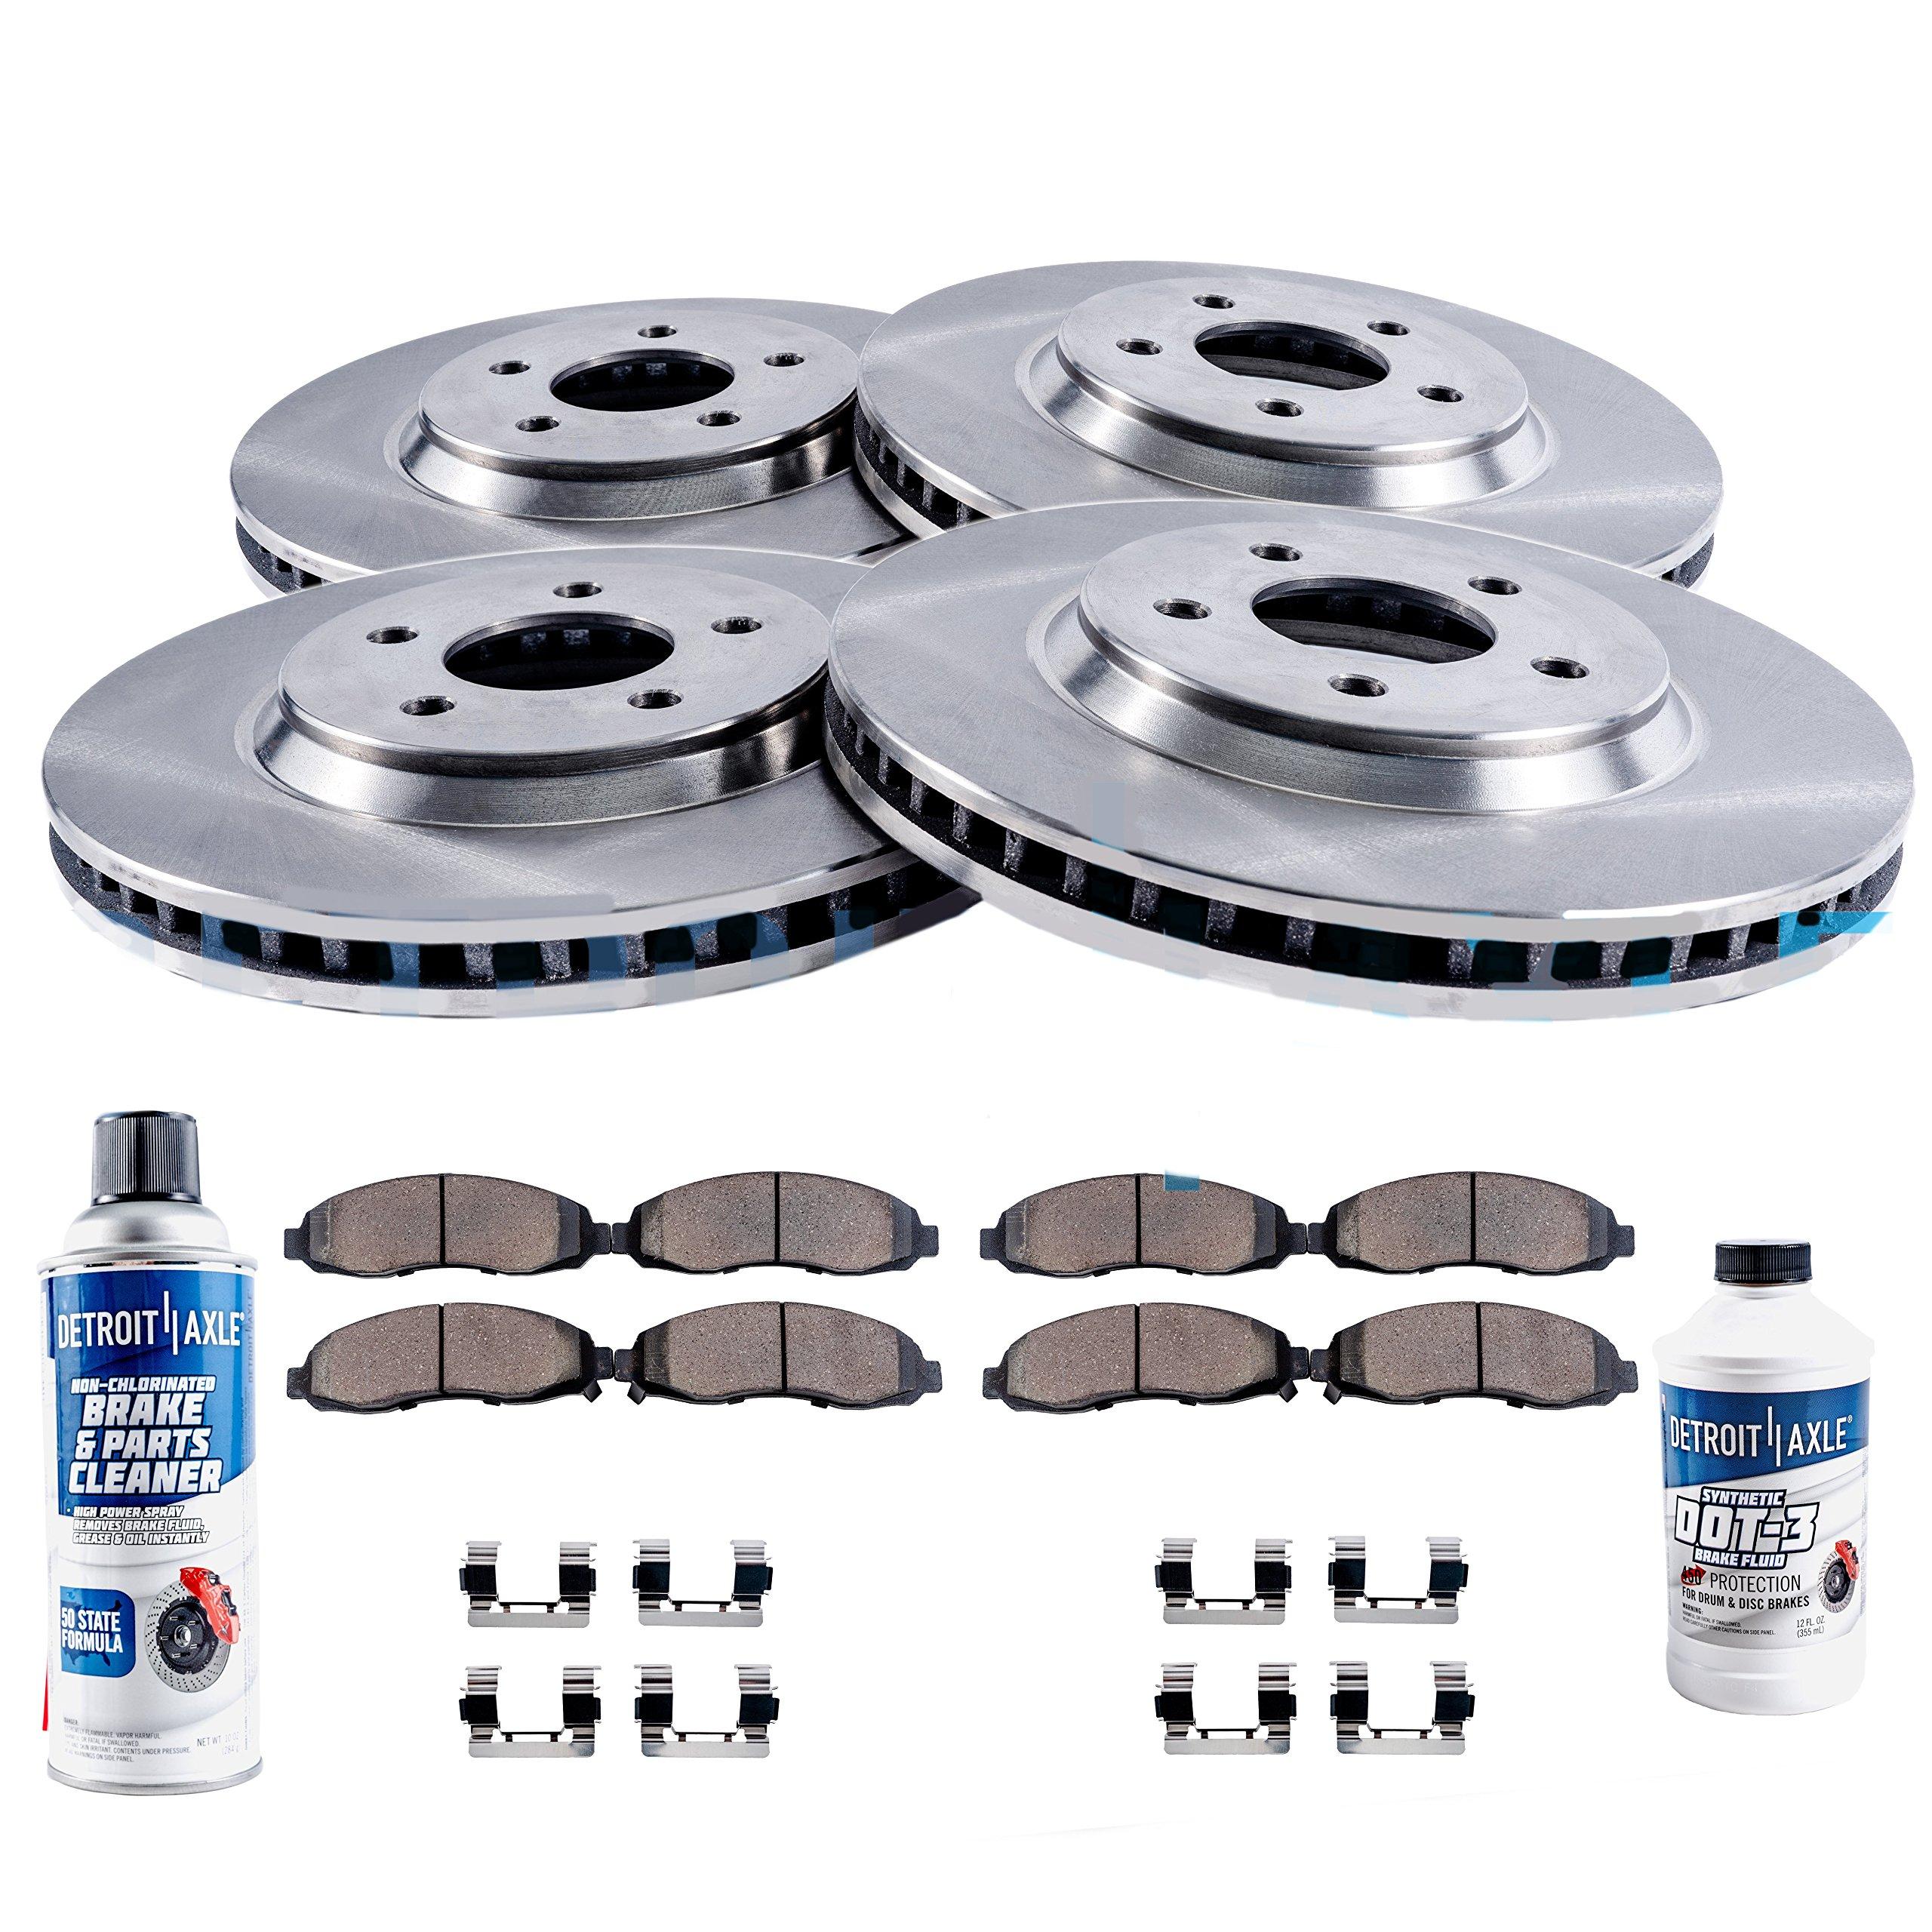 Disc Brake Rotors w//Ceramic Pads for 2006-2010 Ford Explorer//Mercury Mountaineer - Detroit Axle Front Wheel Bearing /& Hub 2007-2010 Explorer Sport Trac Wheel Hub /& Bearing Assembly